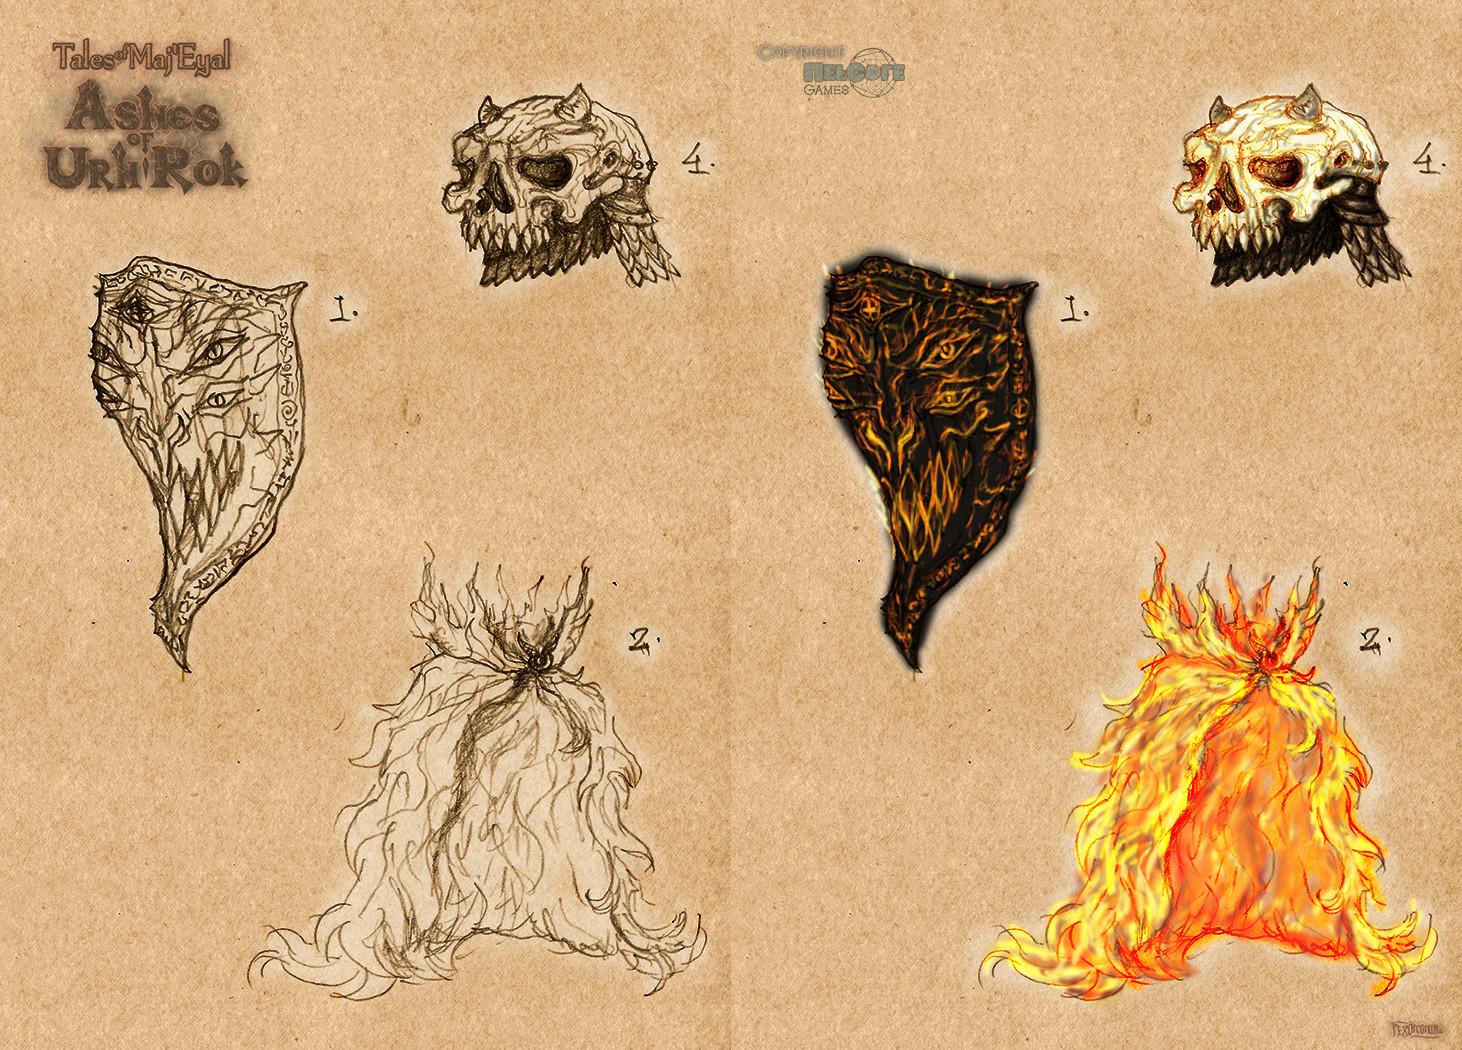 Artifacts (i.e. unique items)